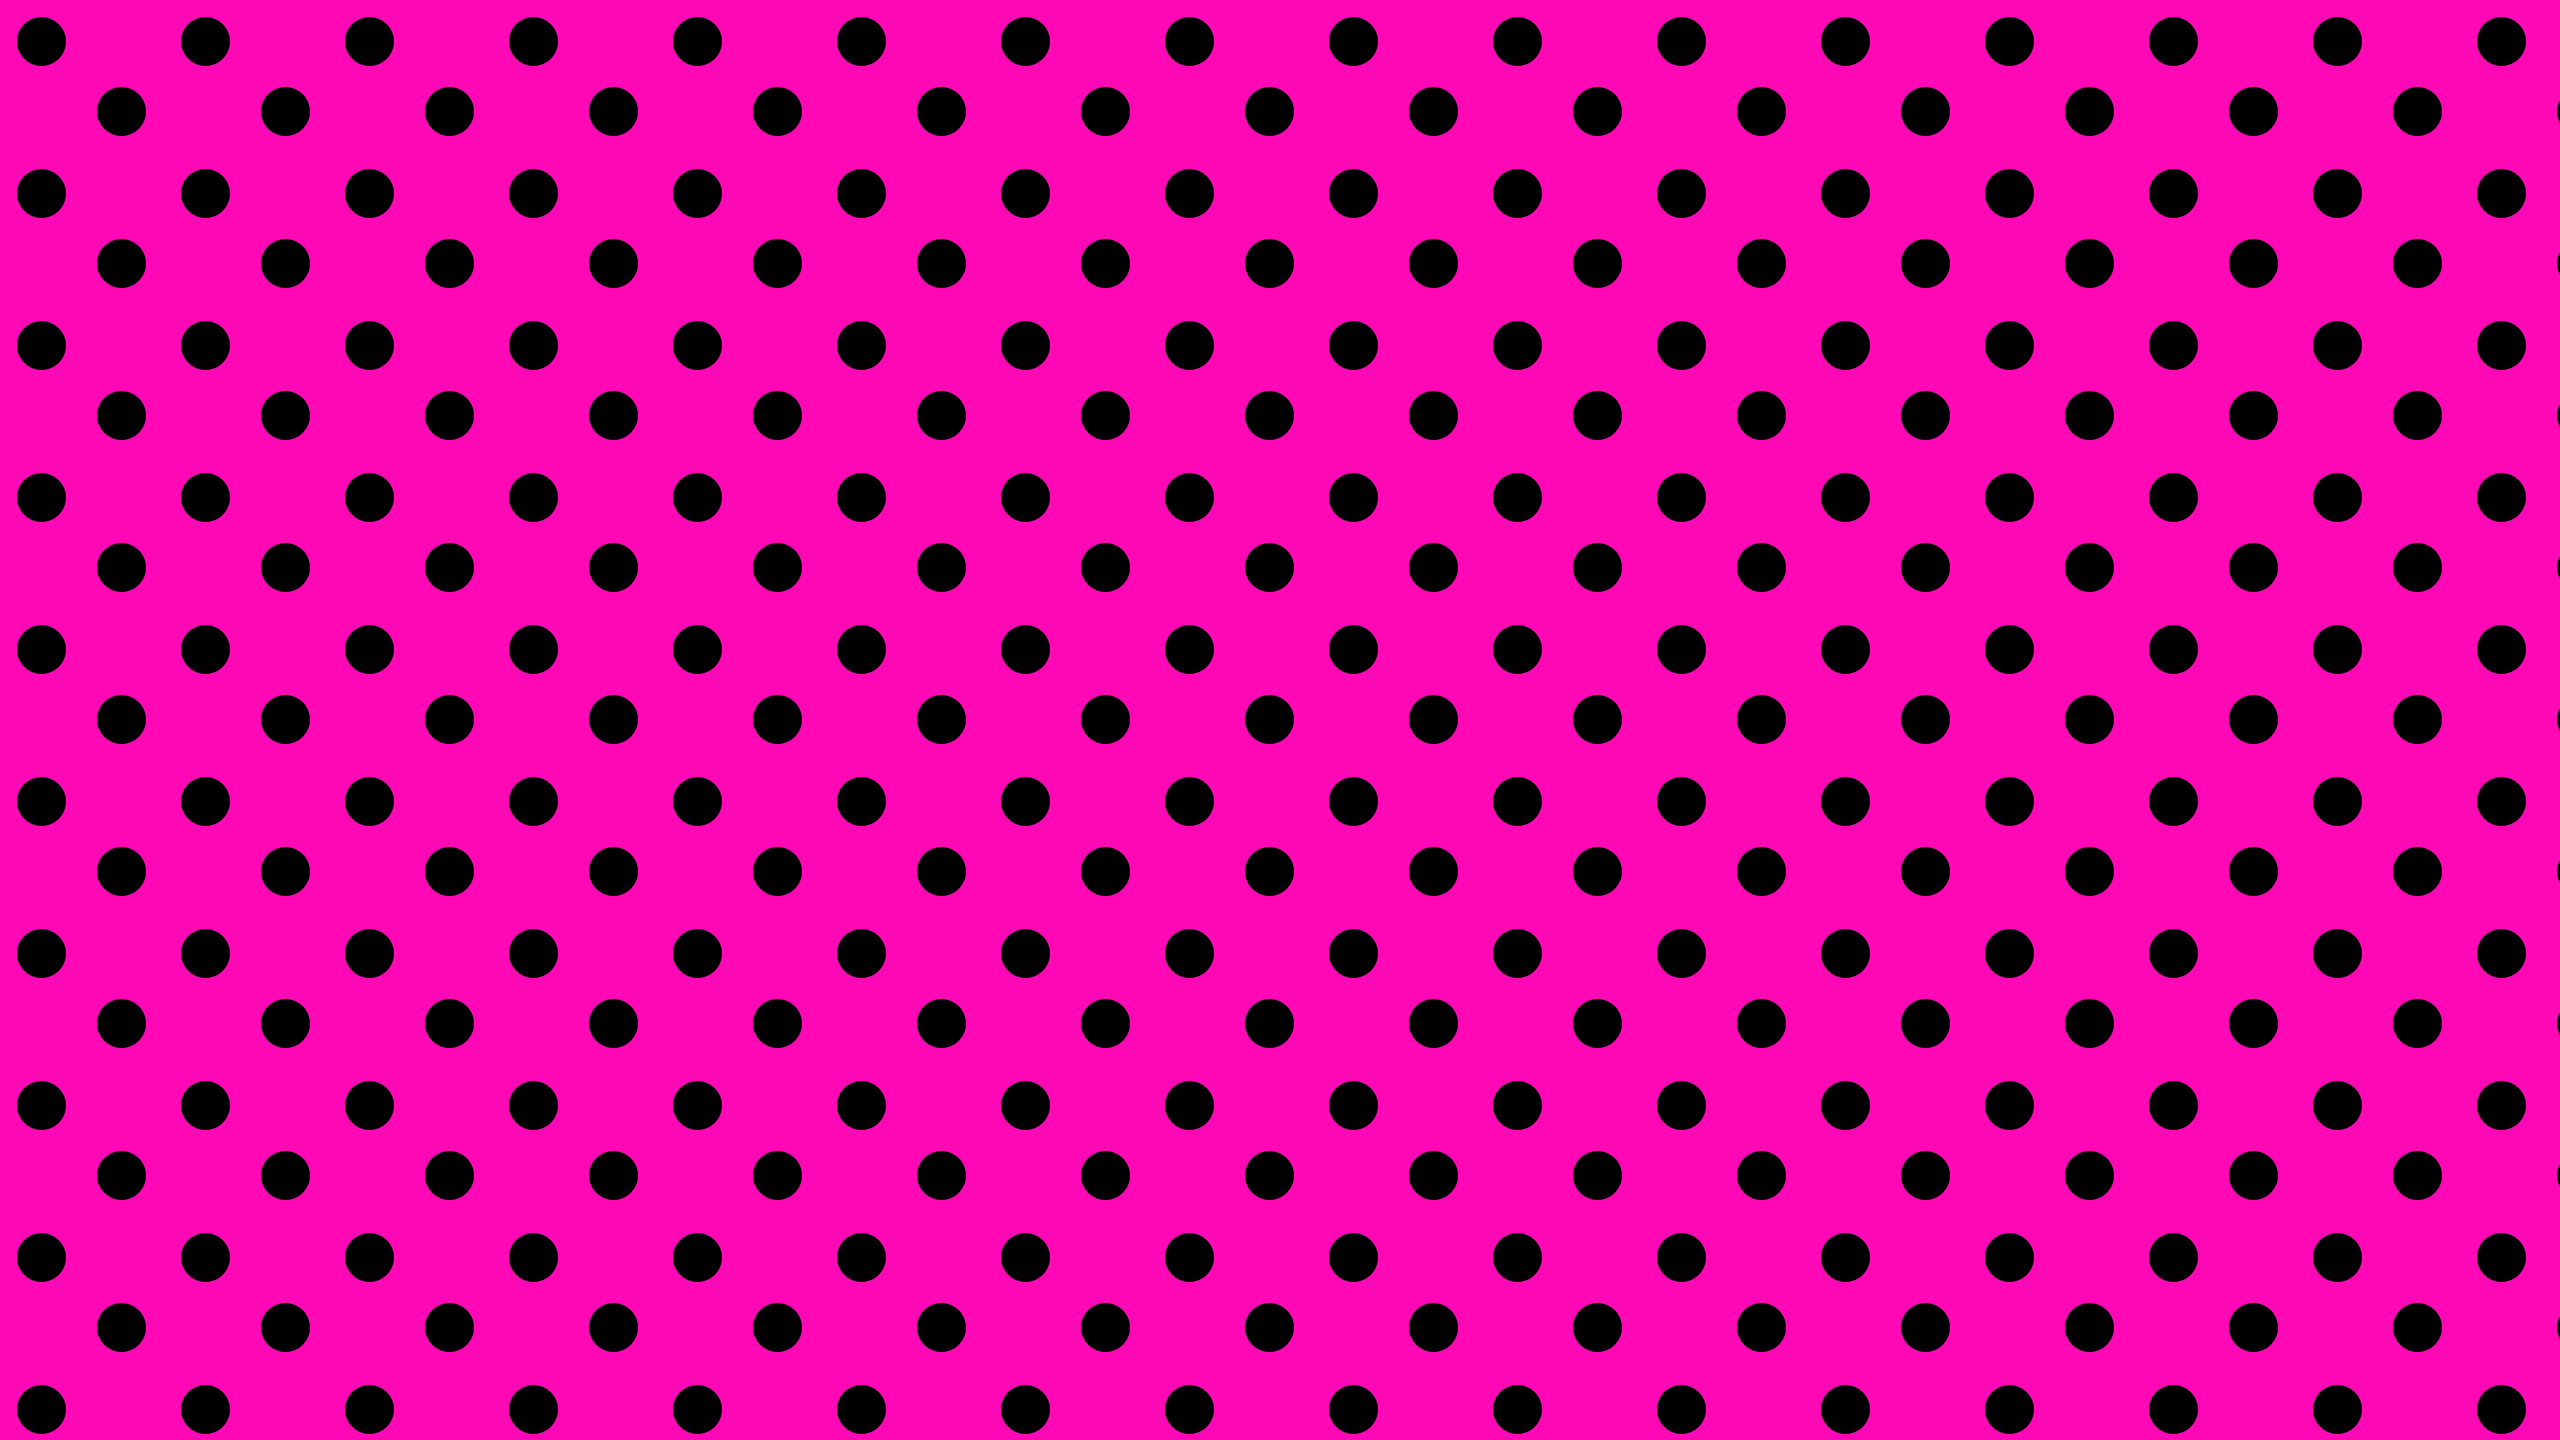 Pink And Black Backgrounds For Desktop  Wallpaper Cave